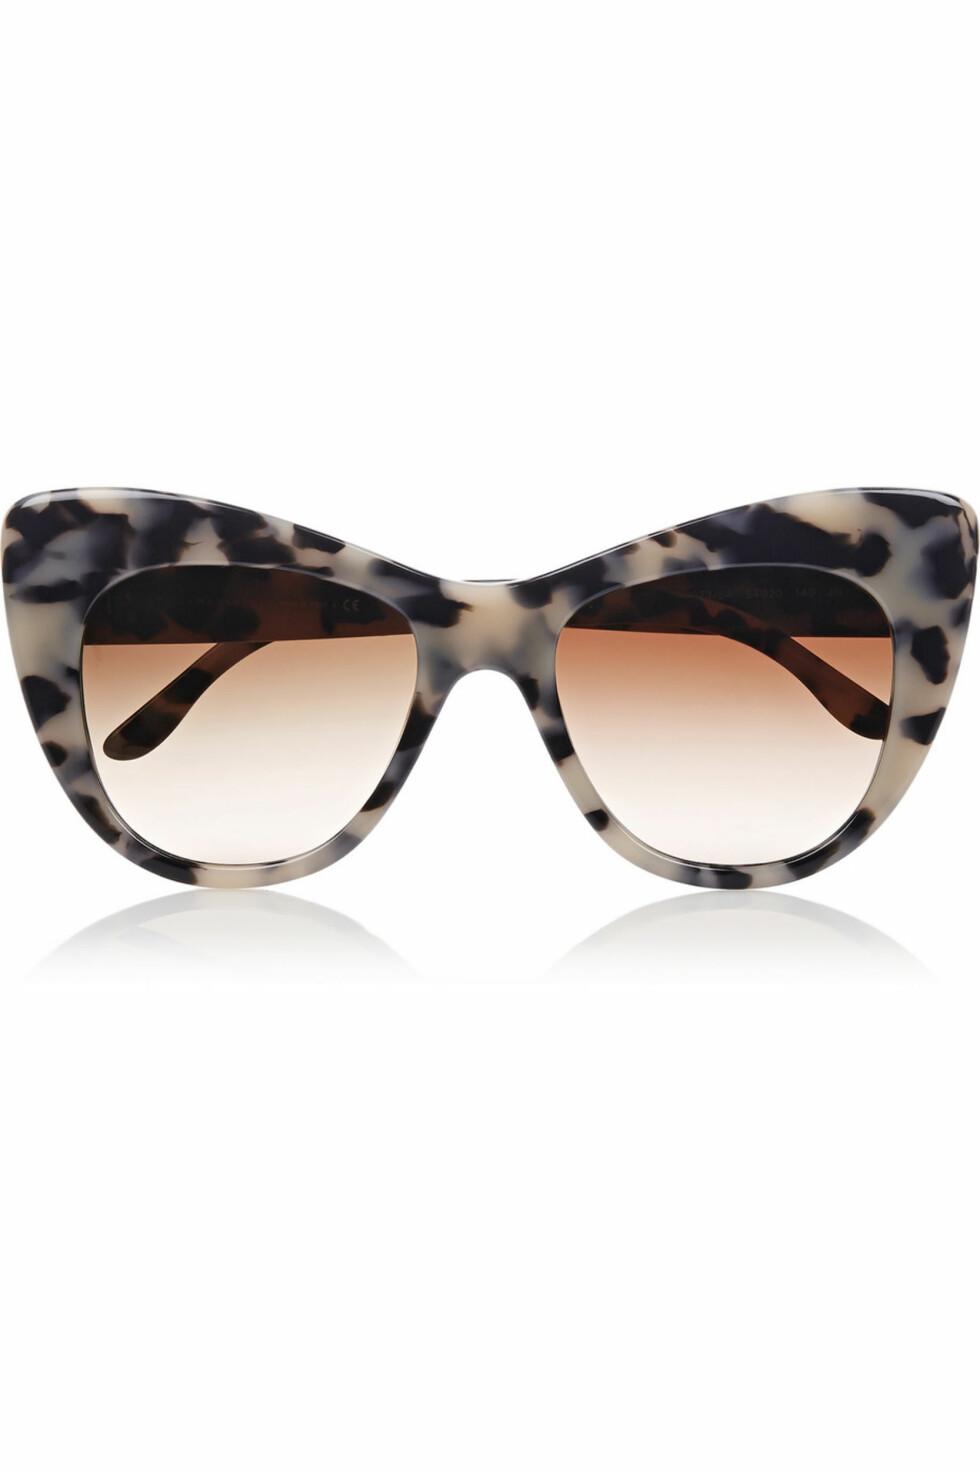 Solbriller fra Stella McCartney, ca. kr 1600.  Foto: Net-a-porter.com